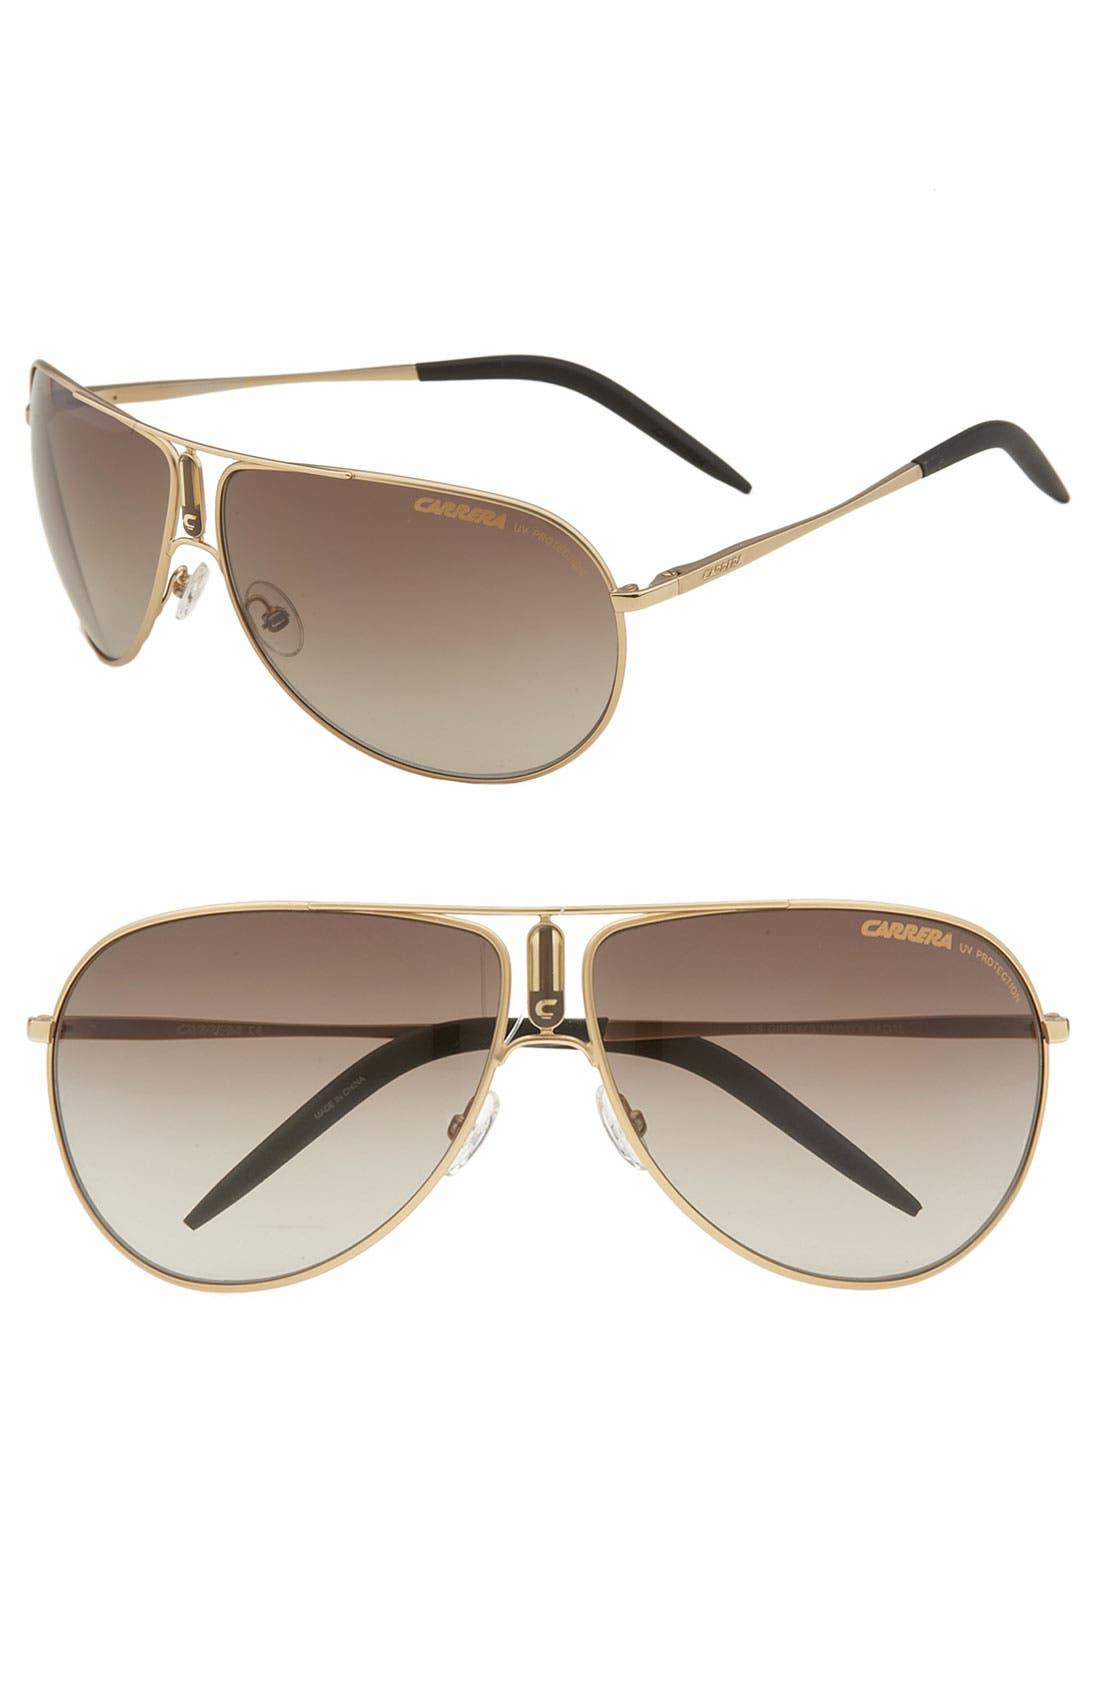 Main Image - Carrera Eyewear 'Gypsy' Metal Aviator Sunglasses